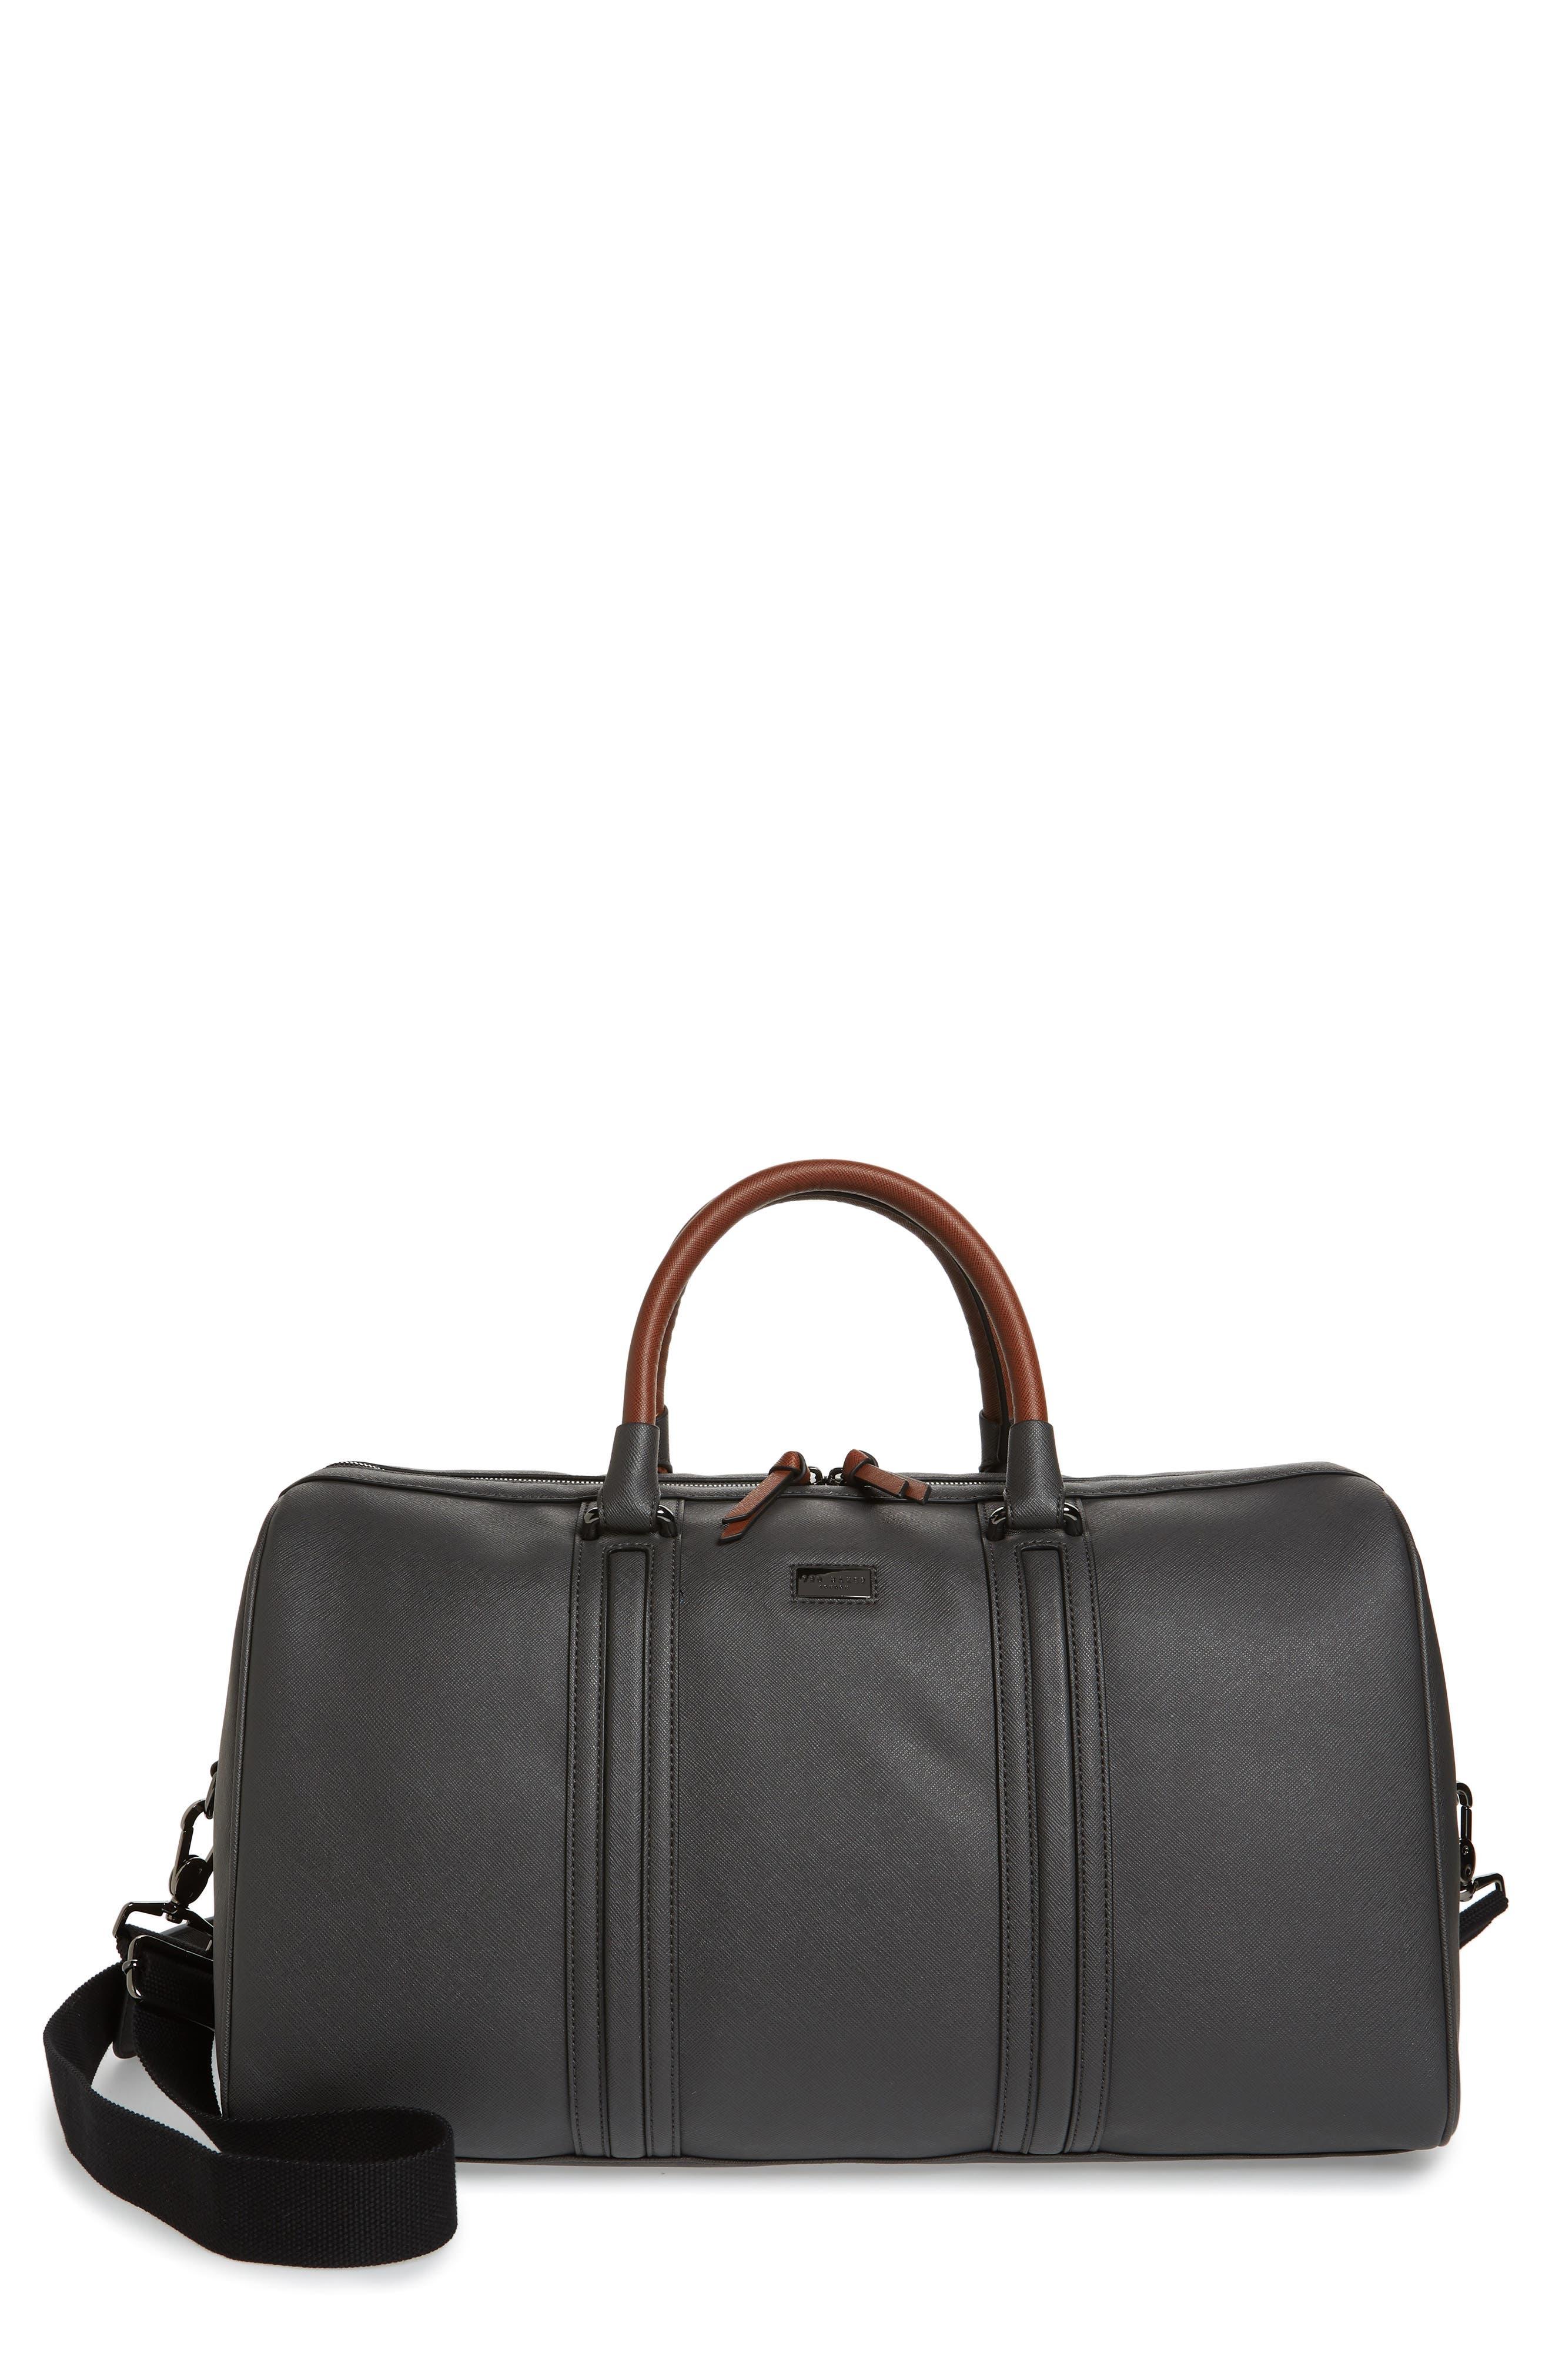 Grankan Faux Leather Duffel Bag,                             Main thumbnail 1, color,                             CHARCOAL